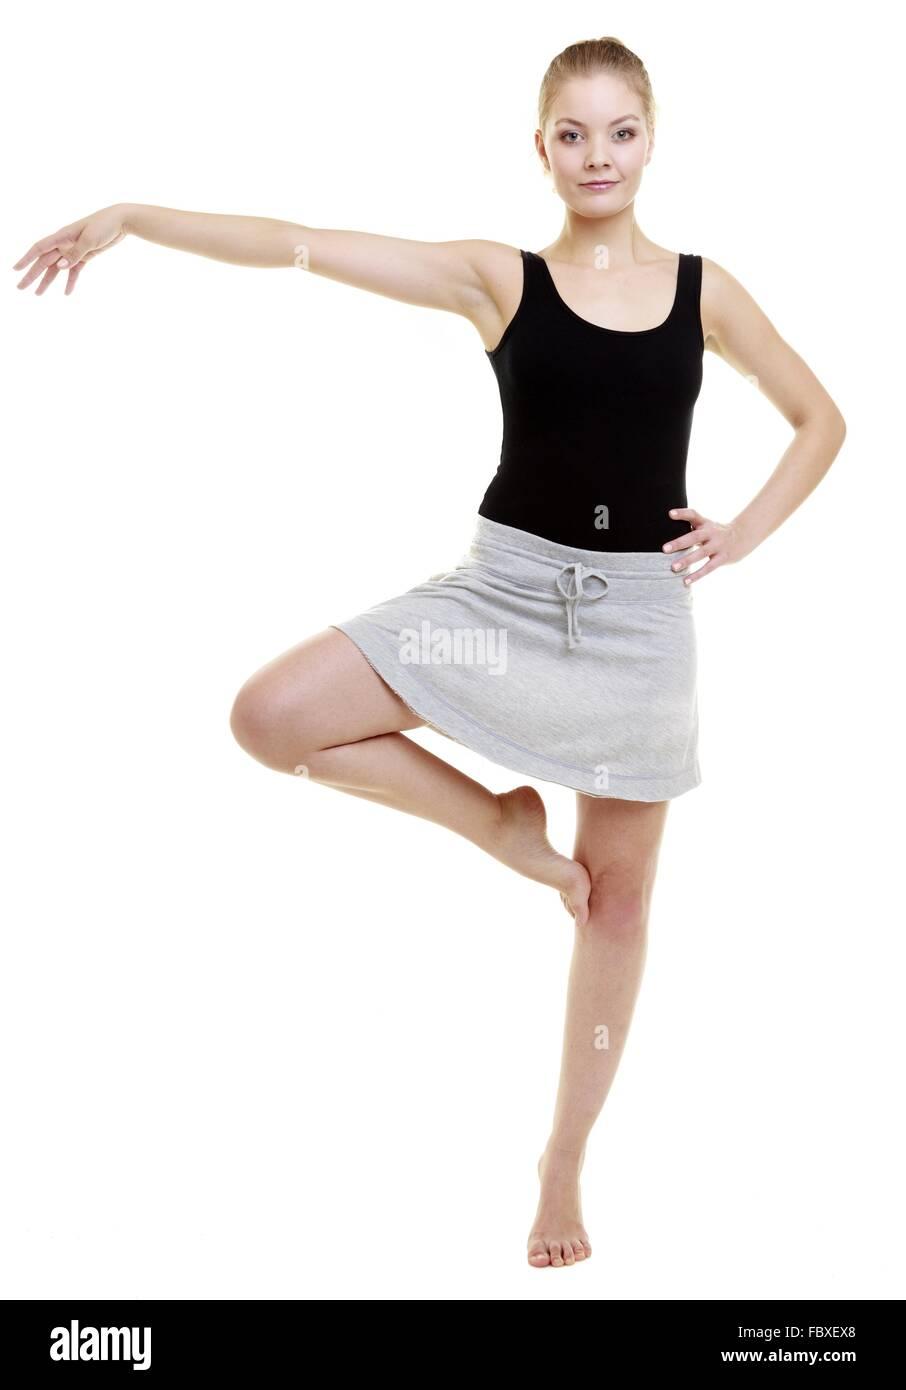 Zumba Dance Fitness Stretching Stock Photos & Zumba Dance Fitness